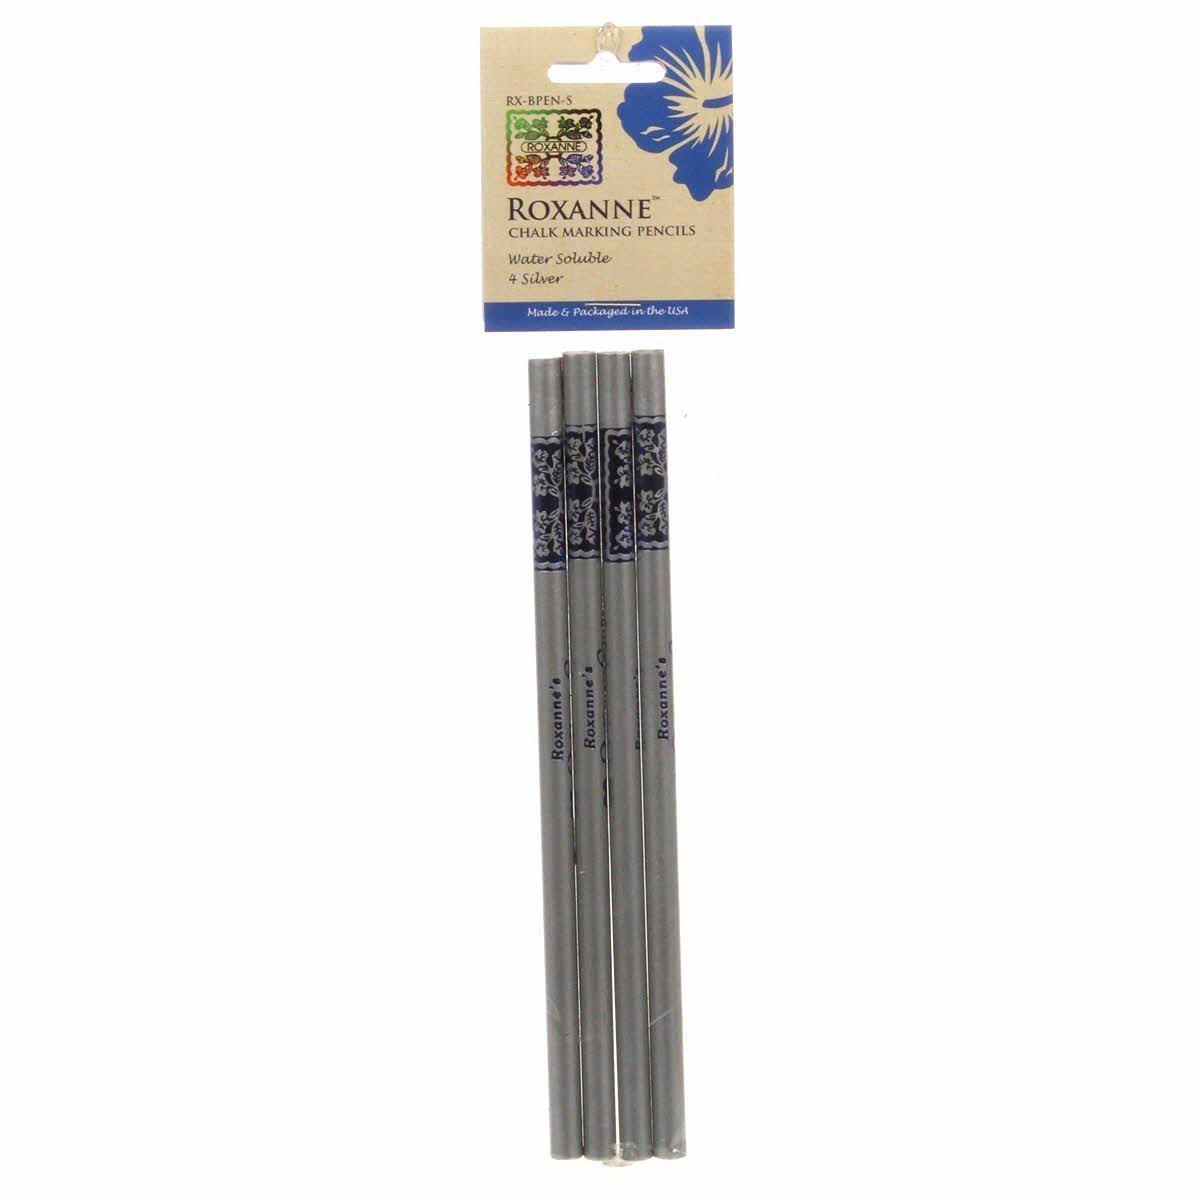 Roxanne - Chalk Marking Pens - RX-BPEN-S